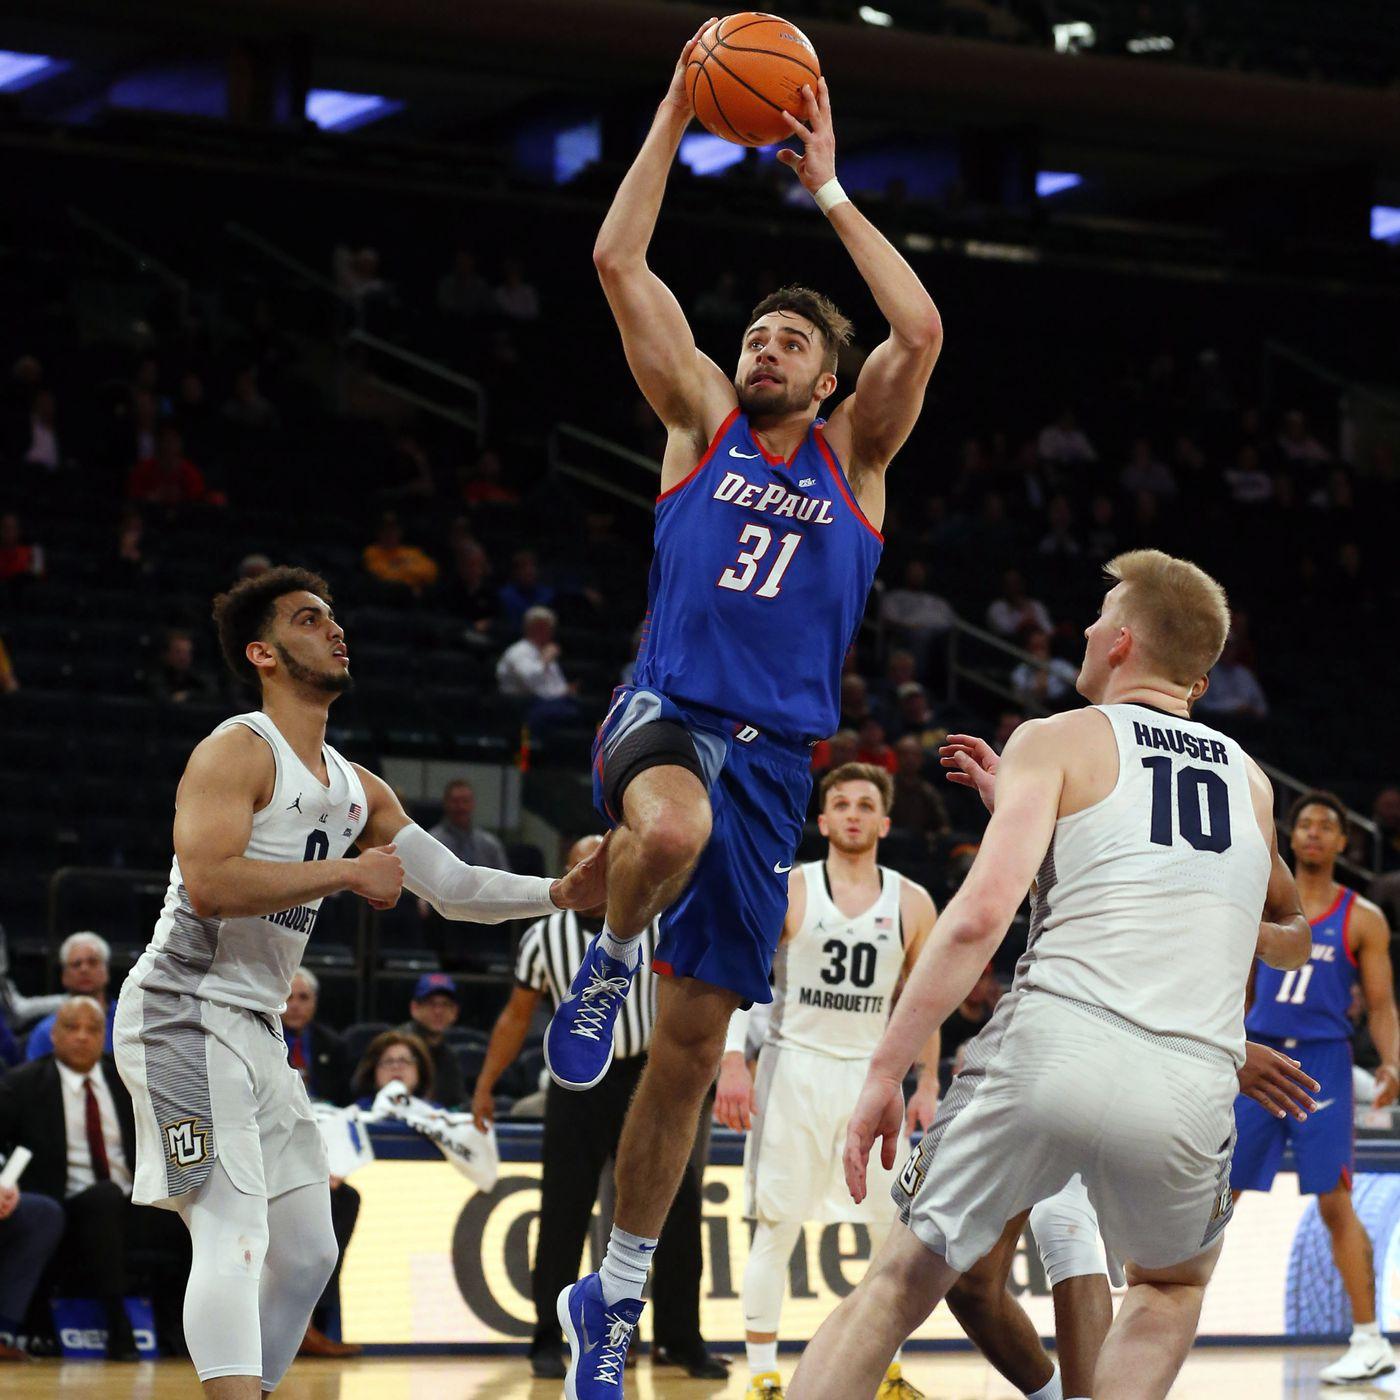 penn state basketball preview: depaul - black shoe diaries